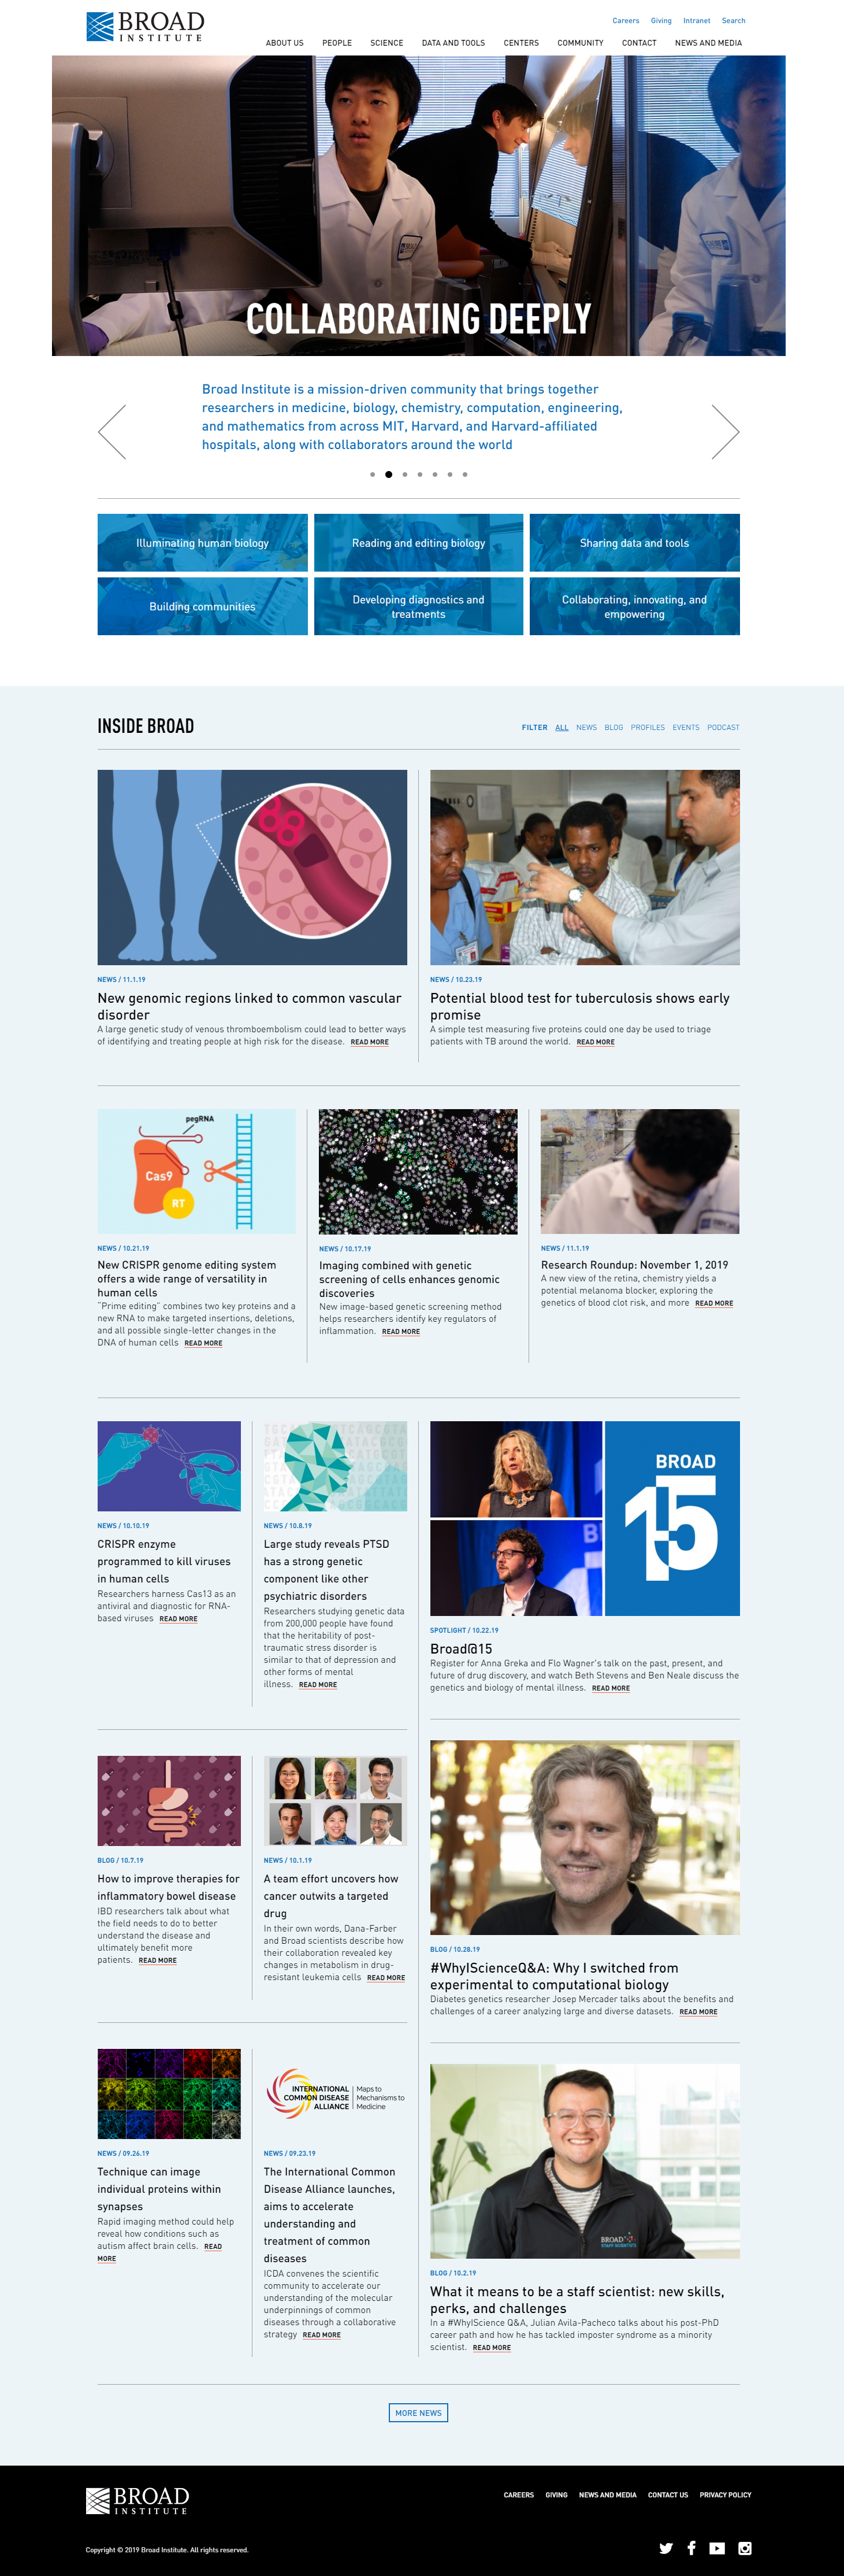 Broad Institute of MIT website development project